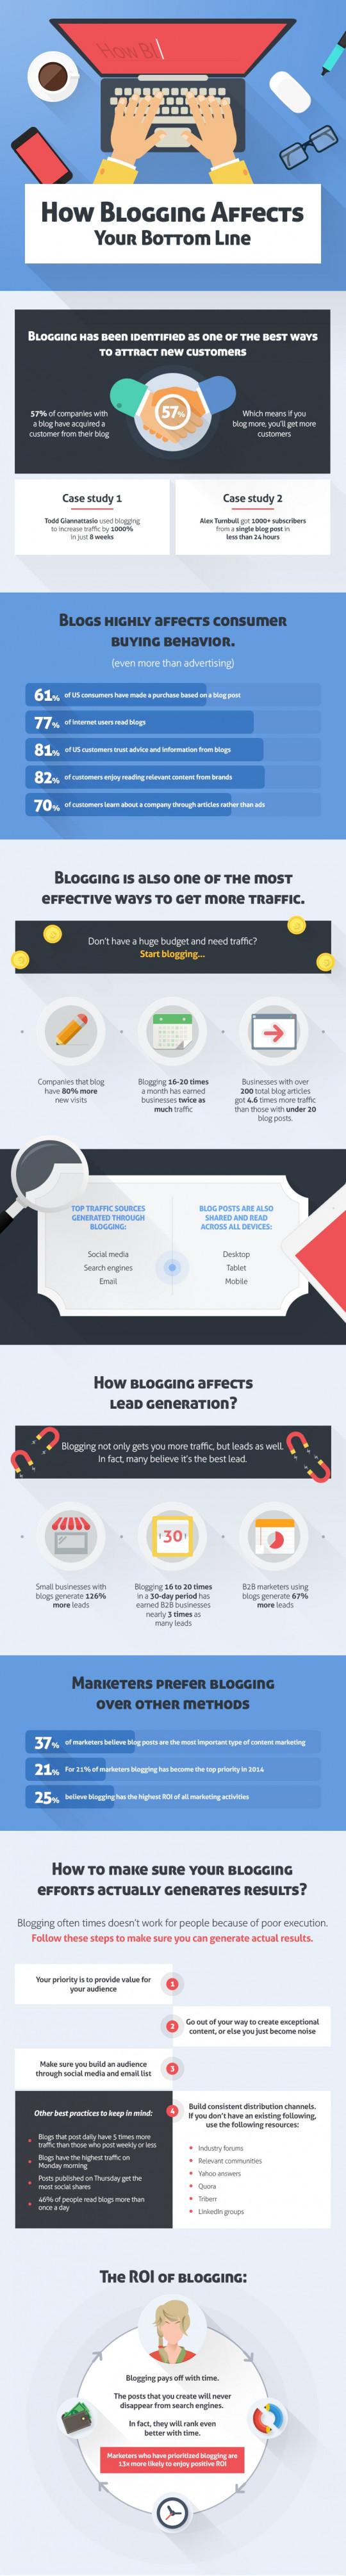 How Blogging Improves your Bottom Line?